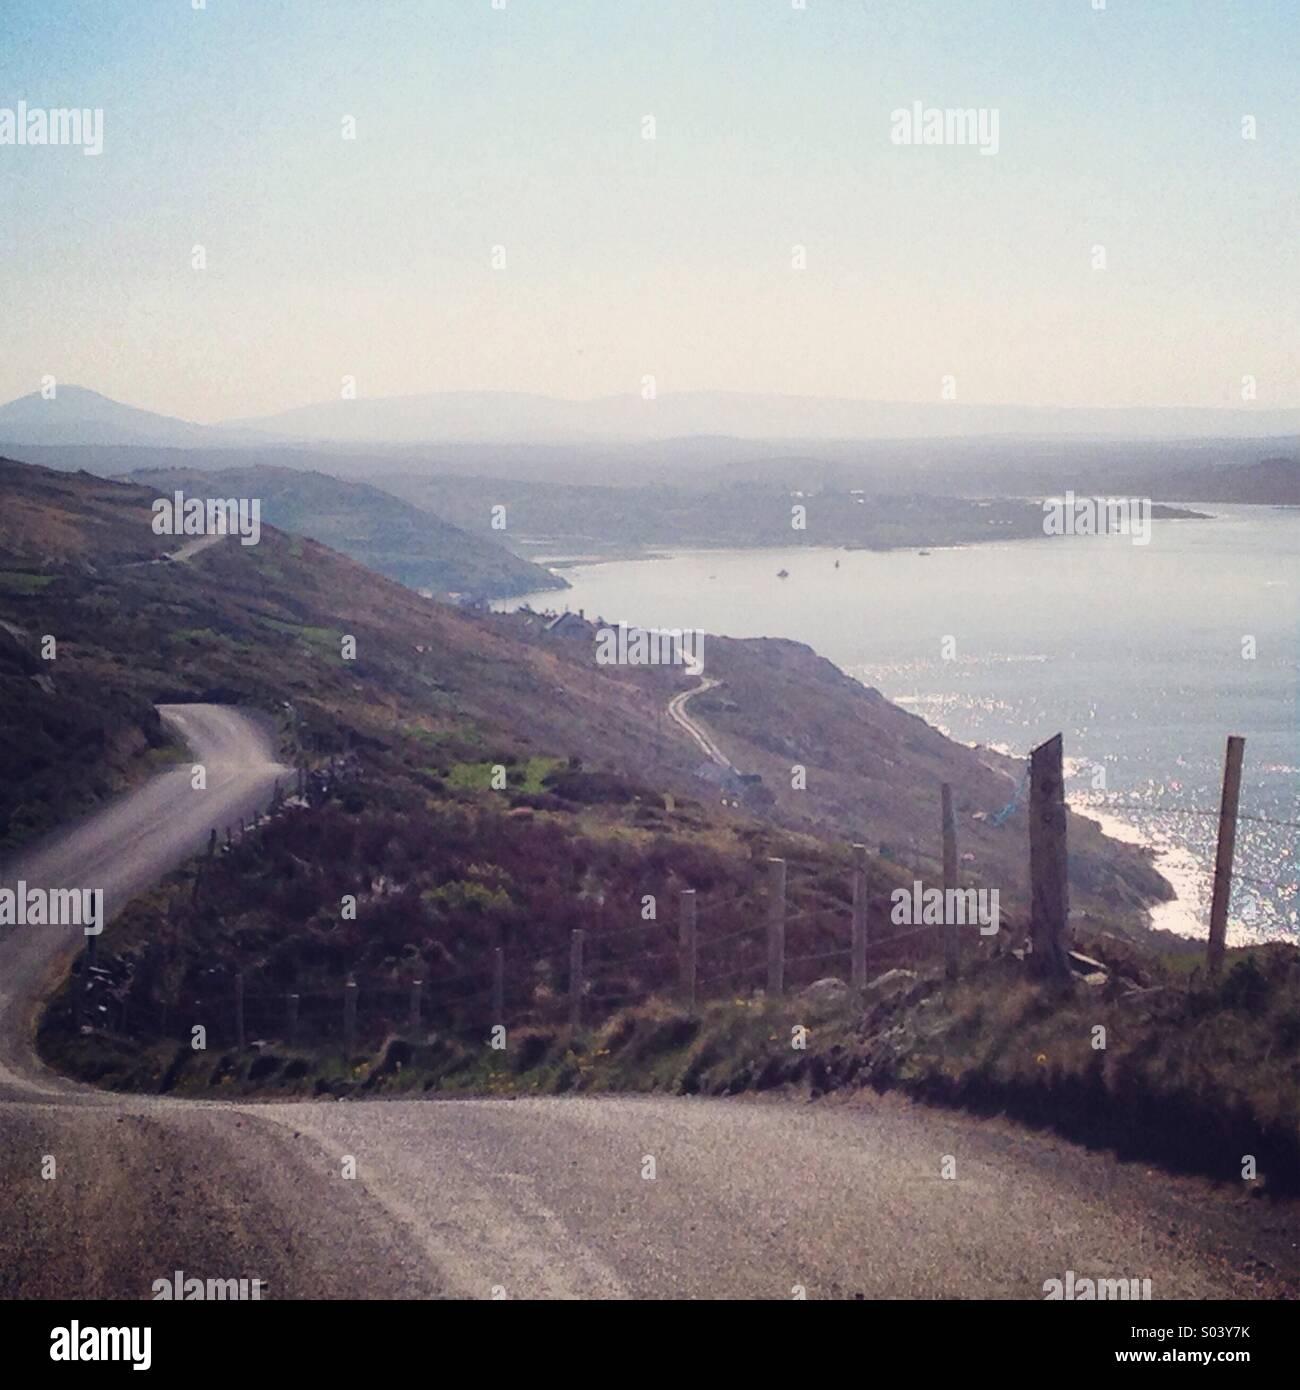 The Sky Road along the Wild Atlantic Way, Connemara, Ireland - Stock Image